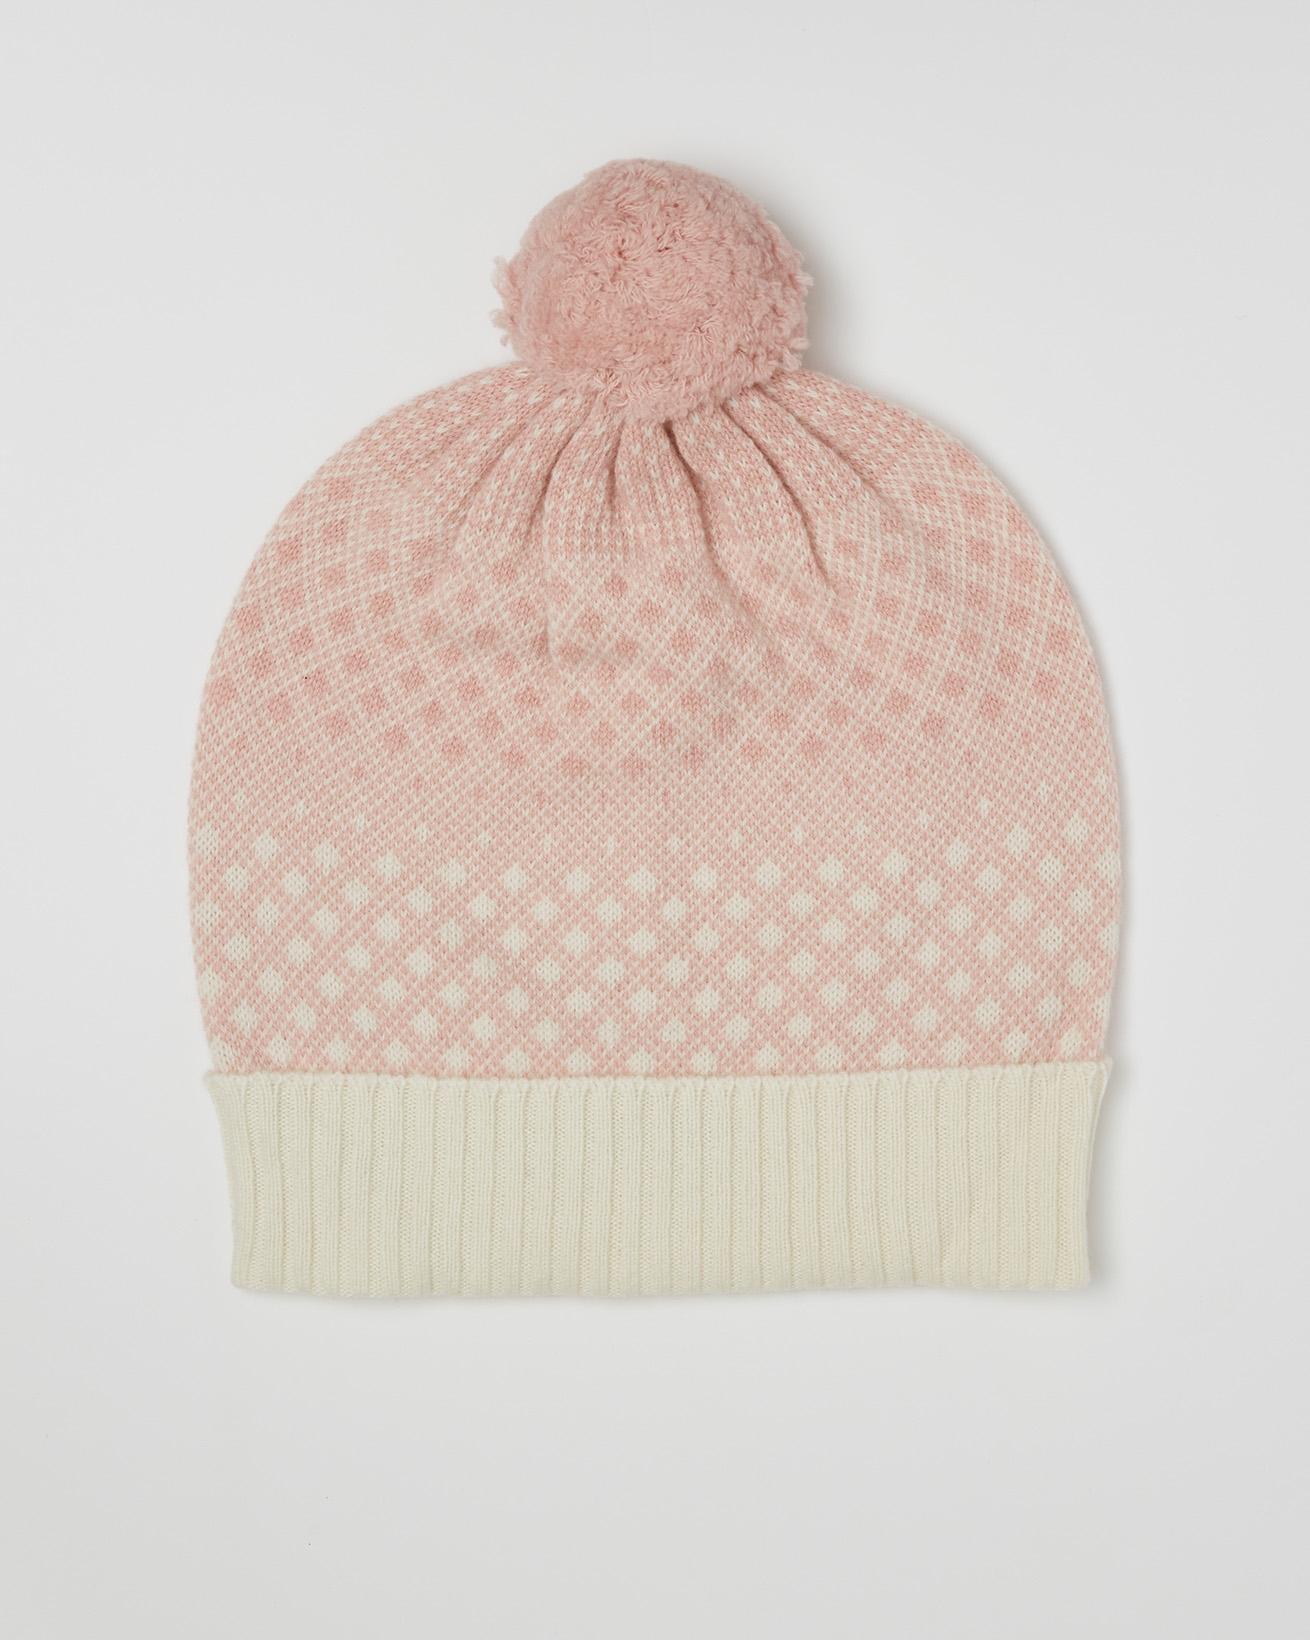 Cashmere Fairisle Pom Pom Beanie - One Size - Pink, Winter White - 2455